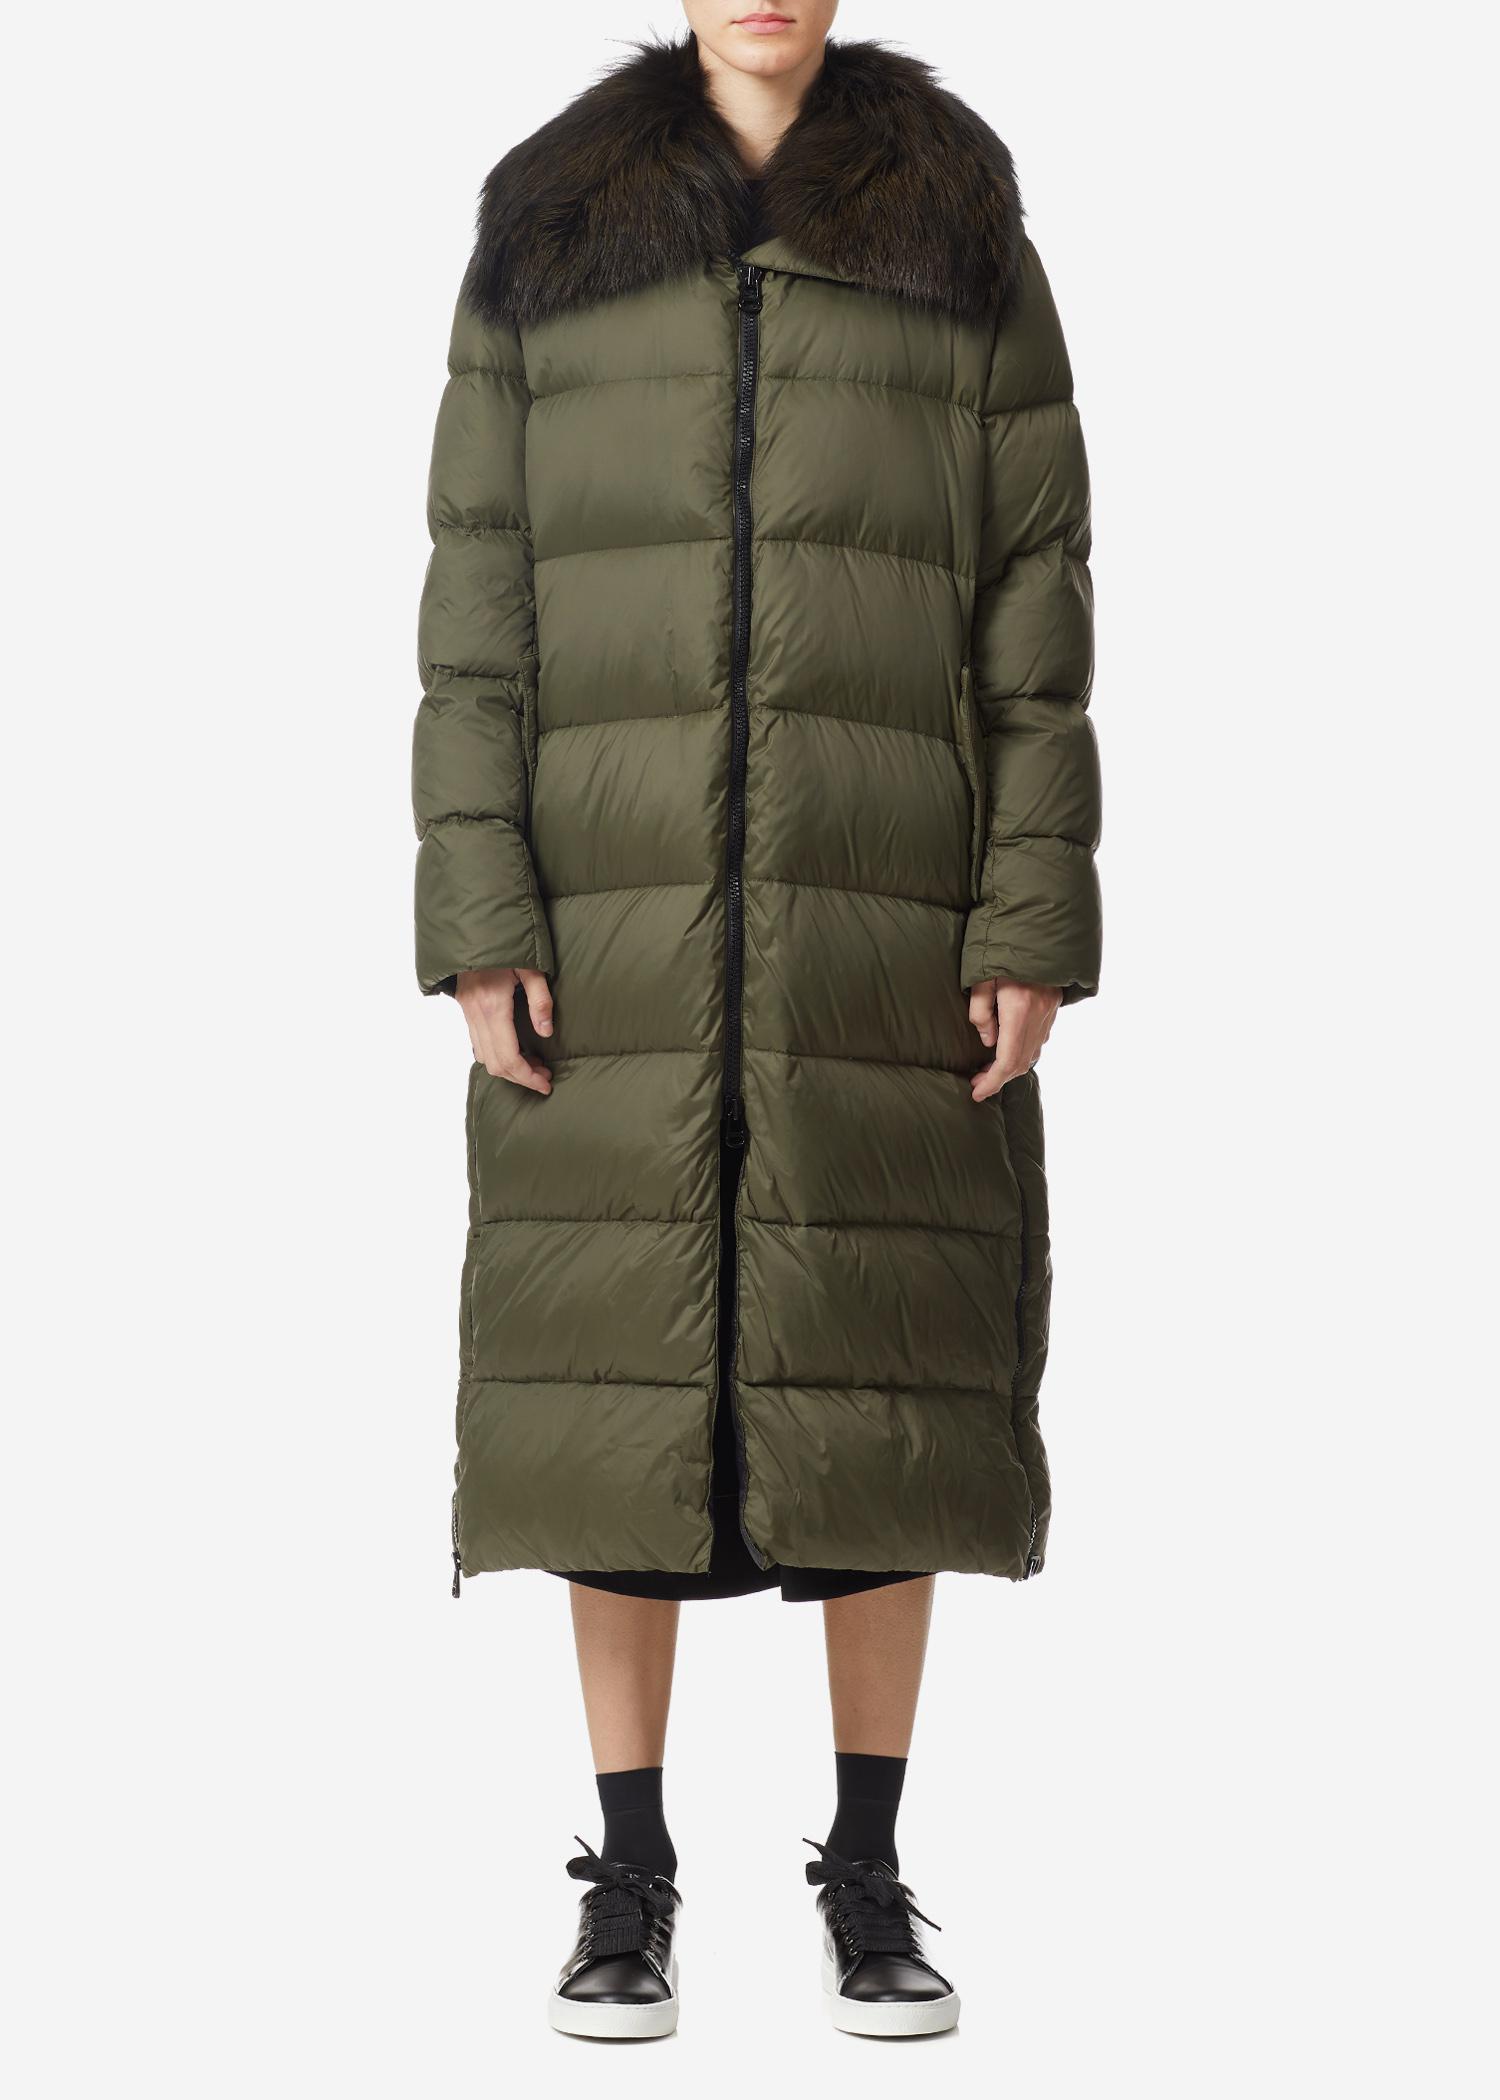 Yves Salomon Ultra Light Padded Long Jacket W/ Fox Fur Collar In Herbal Tea